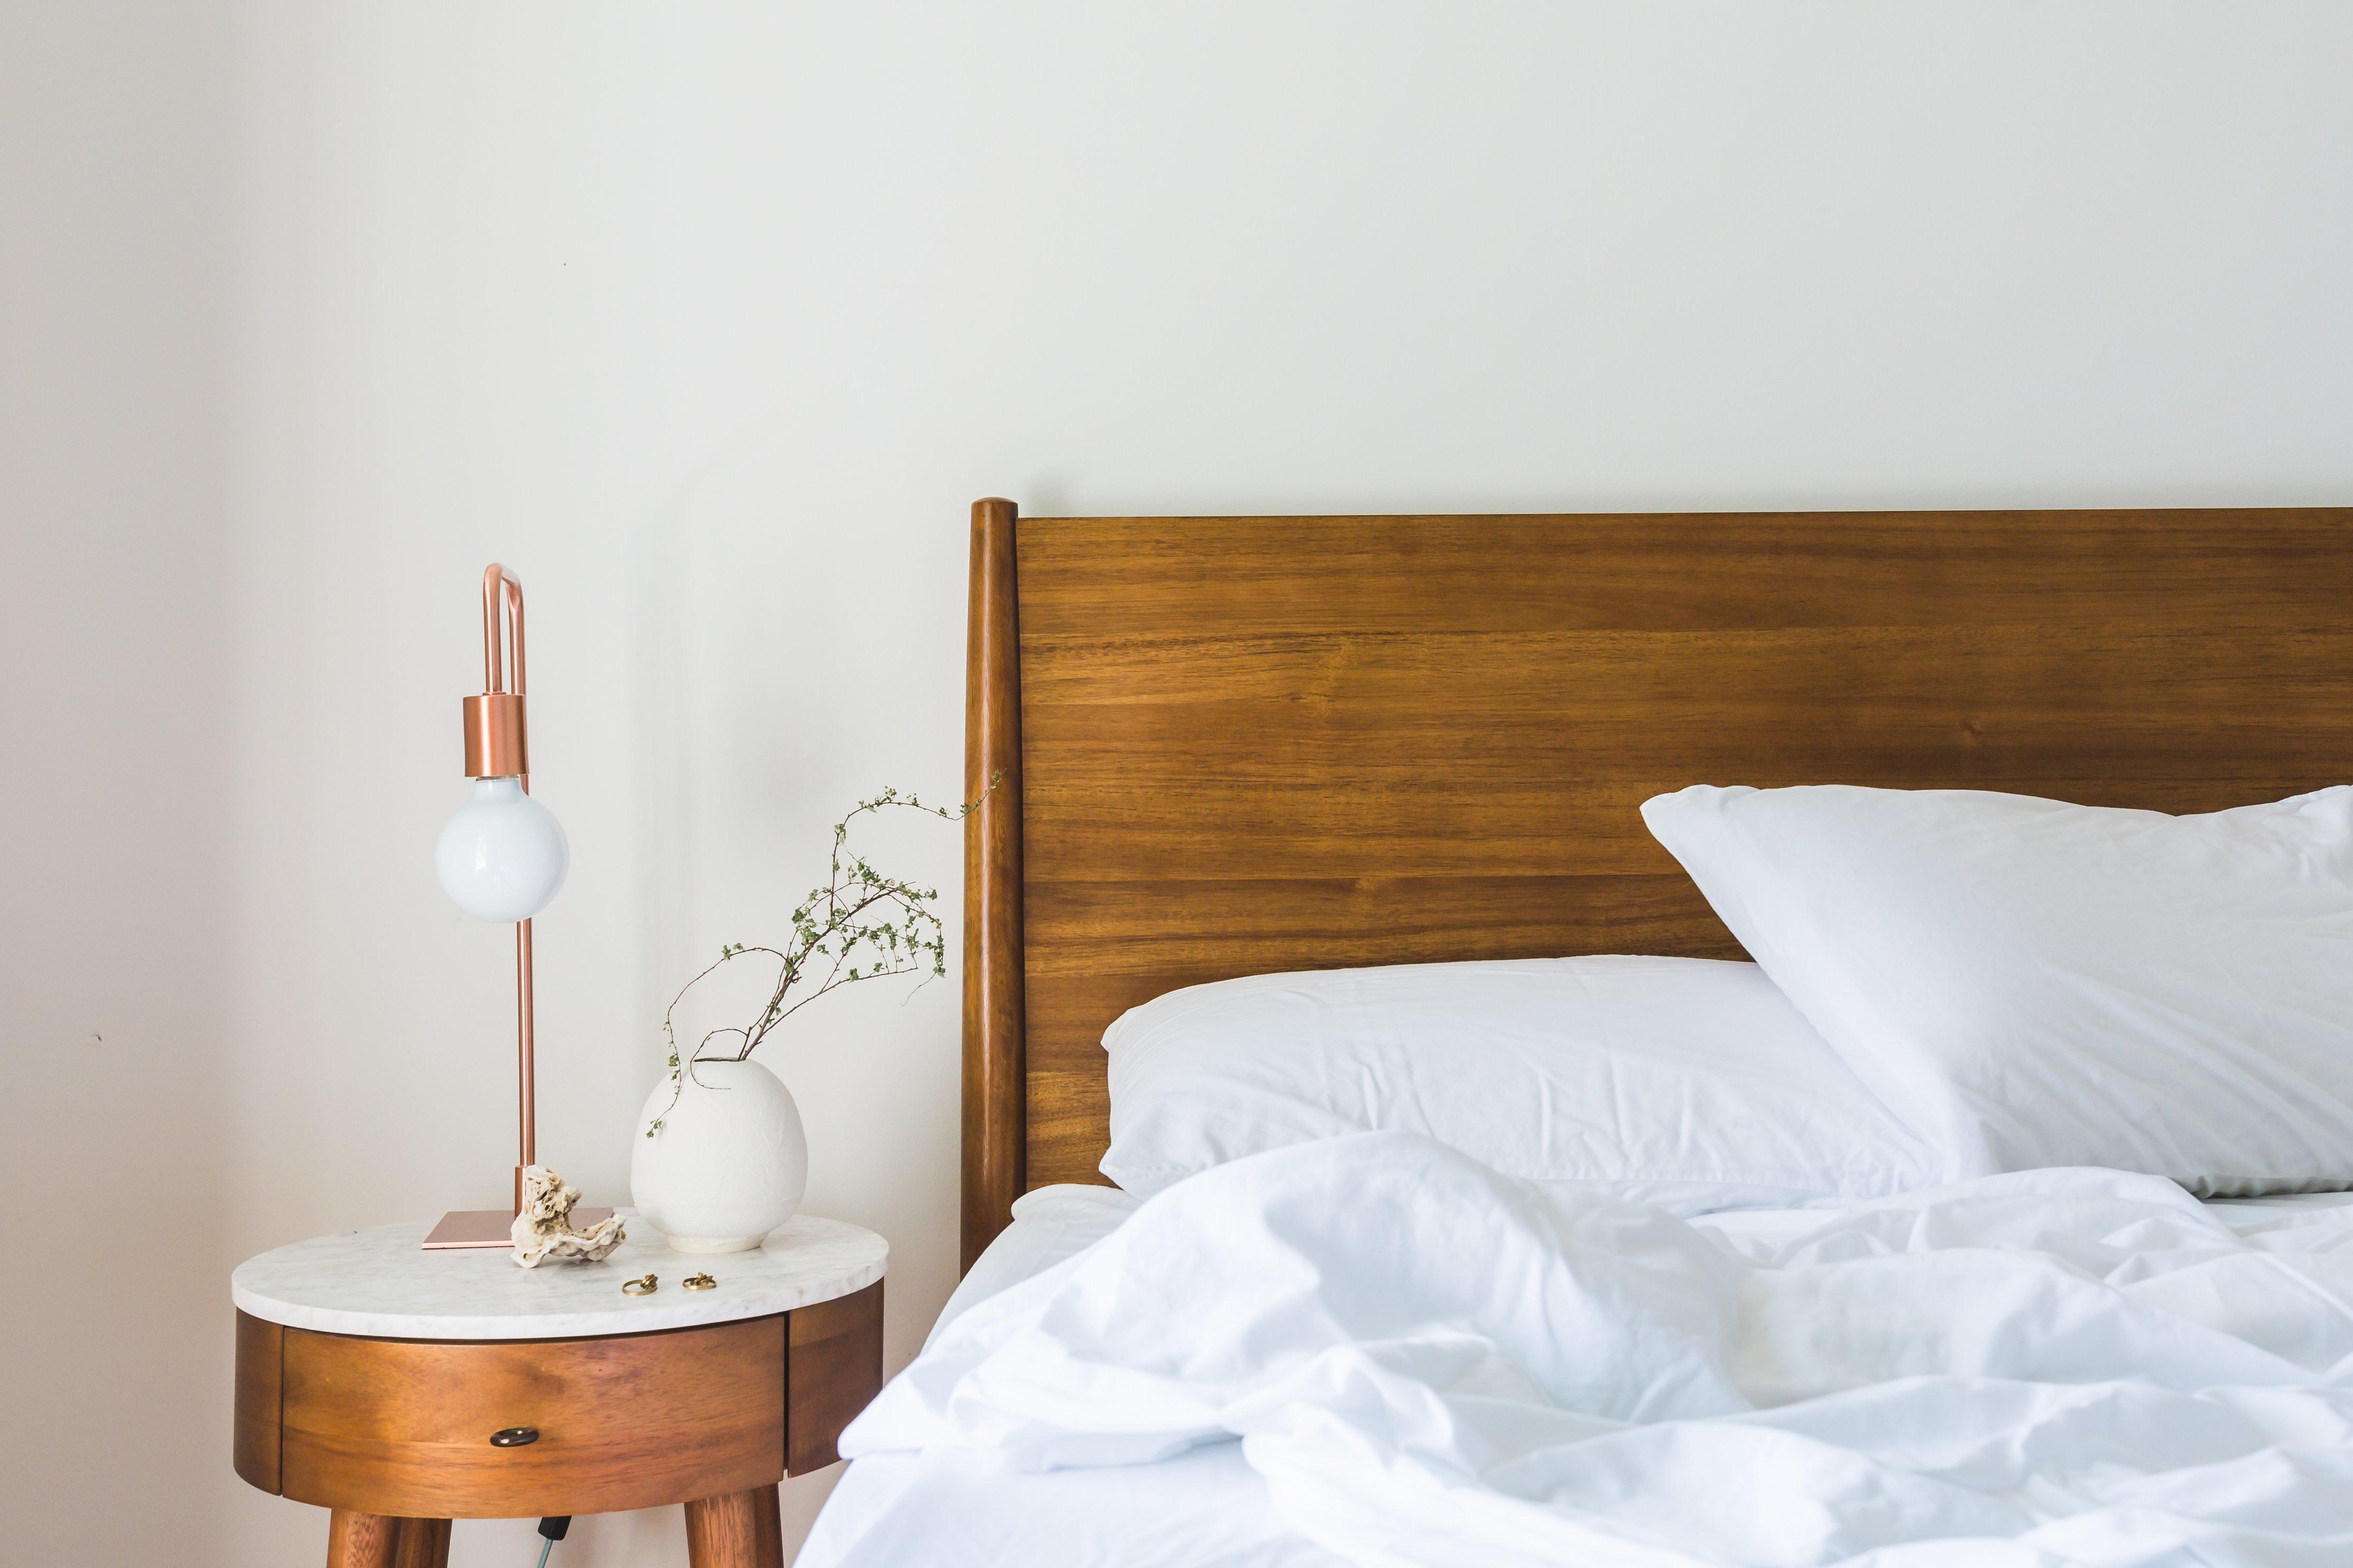 Maak je slaapkamer sfeervol met houten jaloezieën